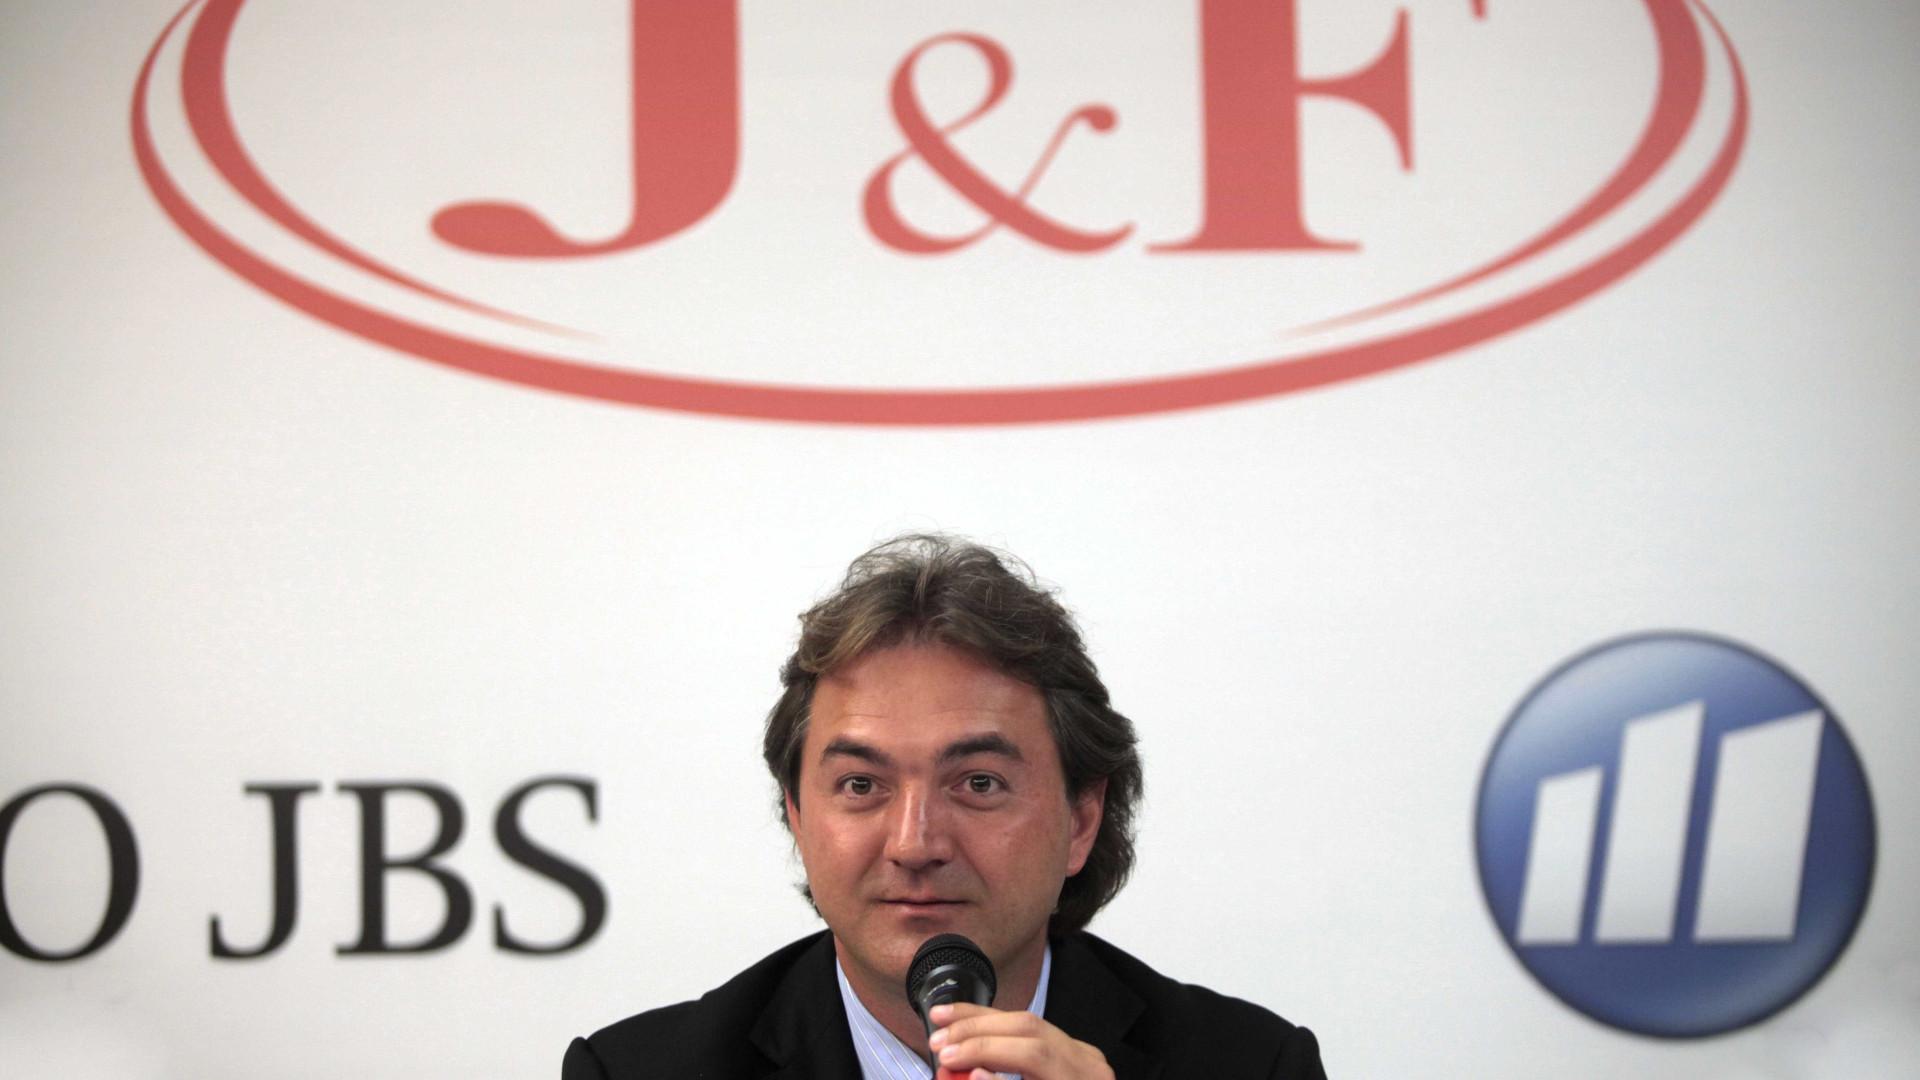 Juiz afasta Joesley Batista, da JBS, do comando de empresas